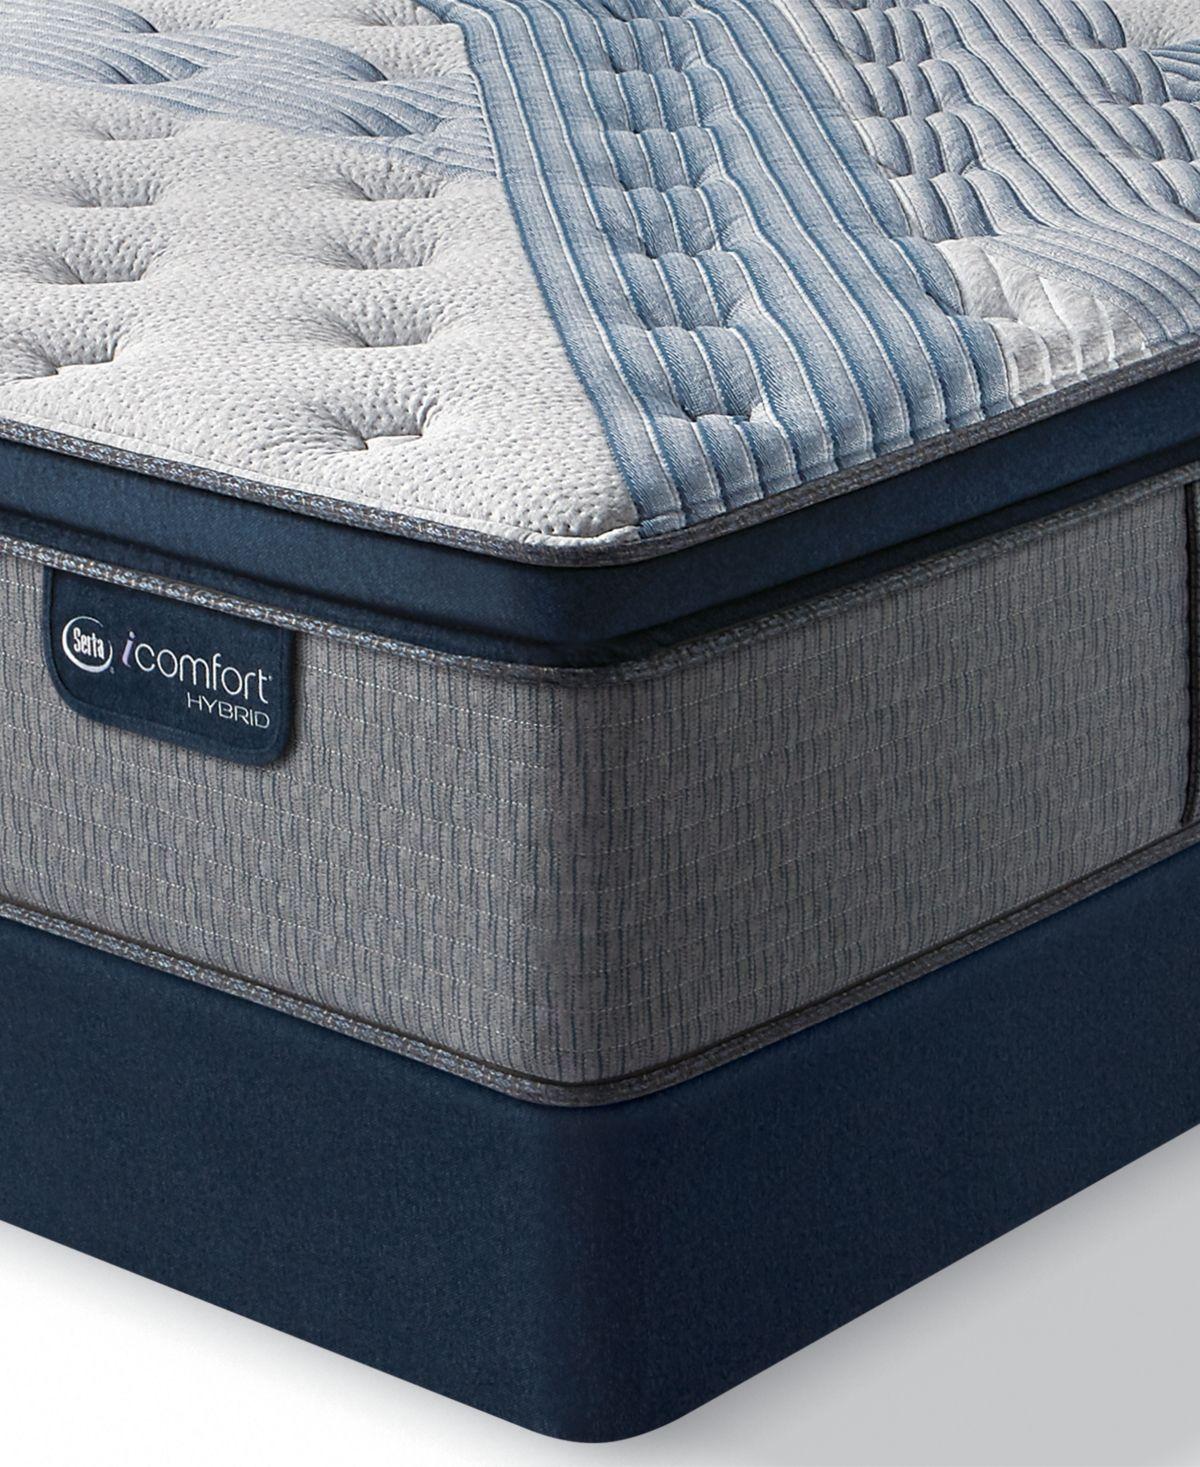 iComfort by Blue Fusion 1000 14.5 Hybrid Luxury Firm Euro Pillow Top Mattress Set - California King #pillowtopmattress